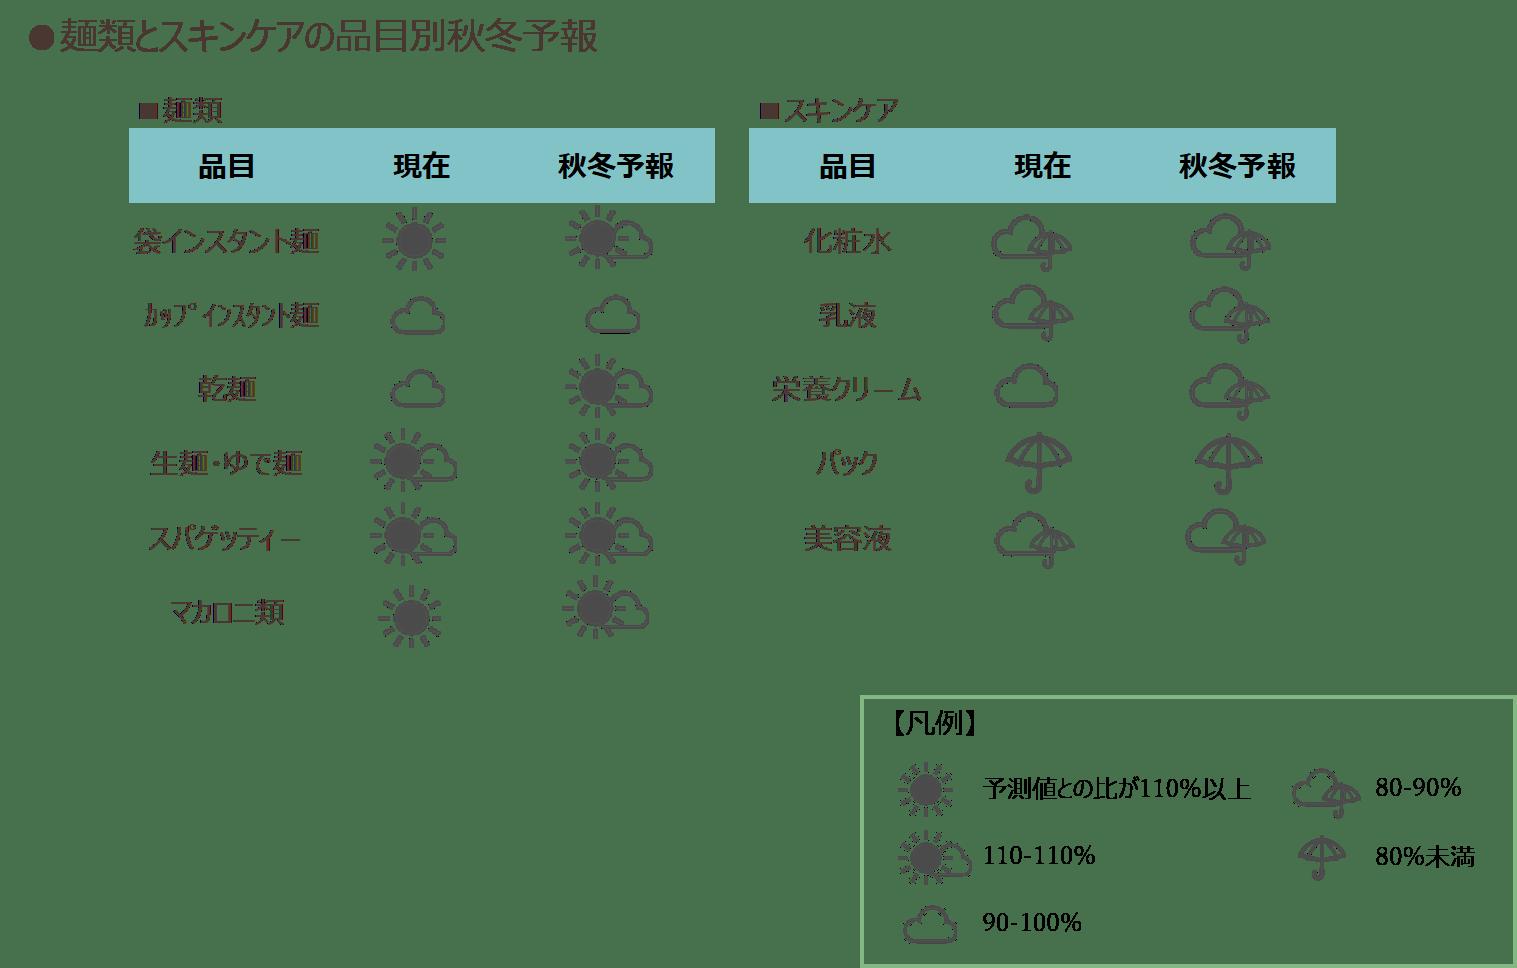 demand-forecast_05.png